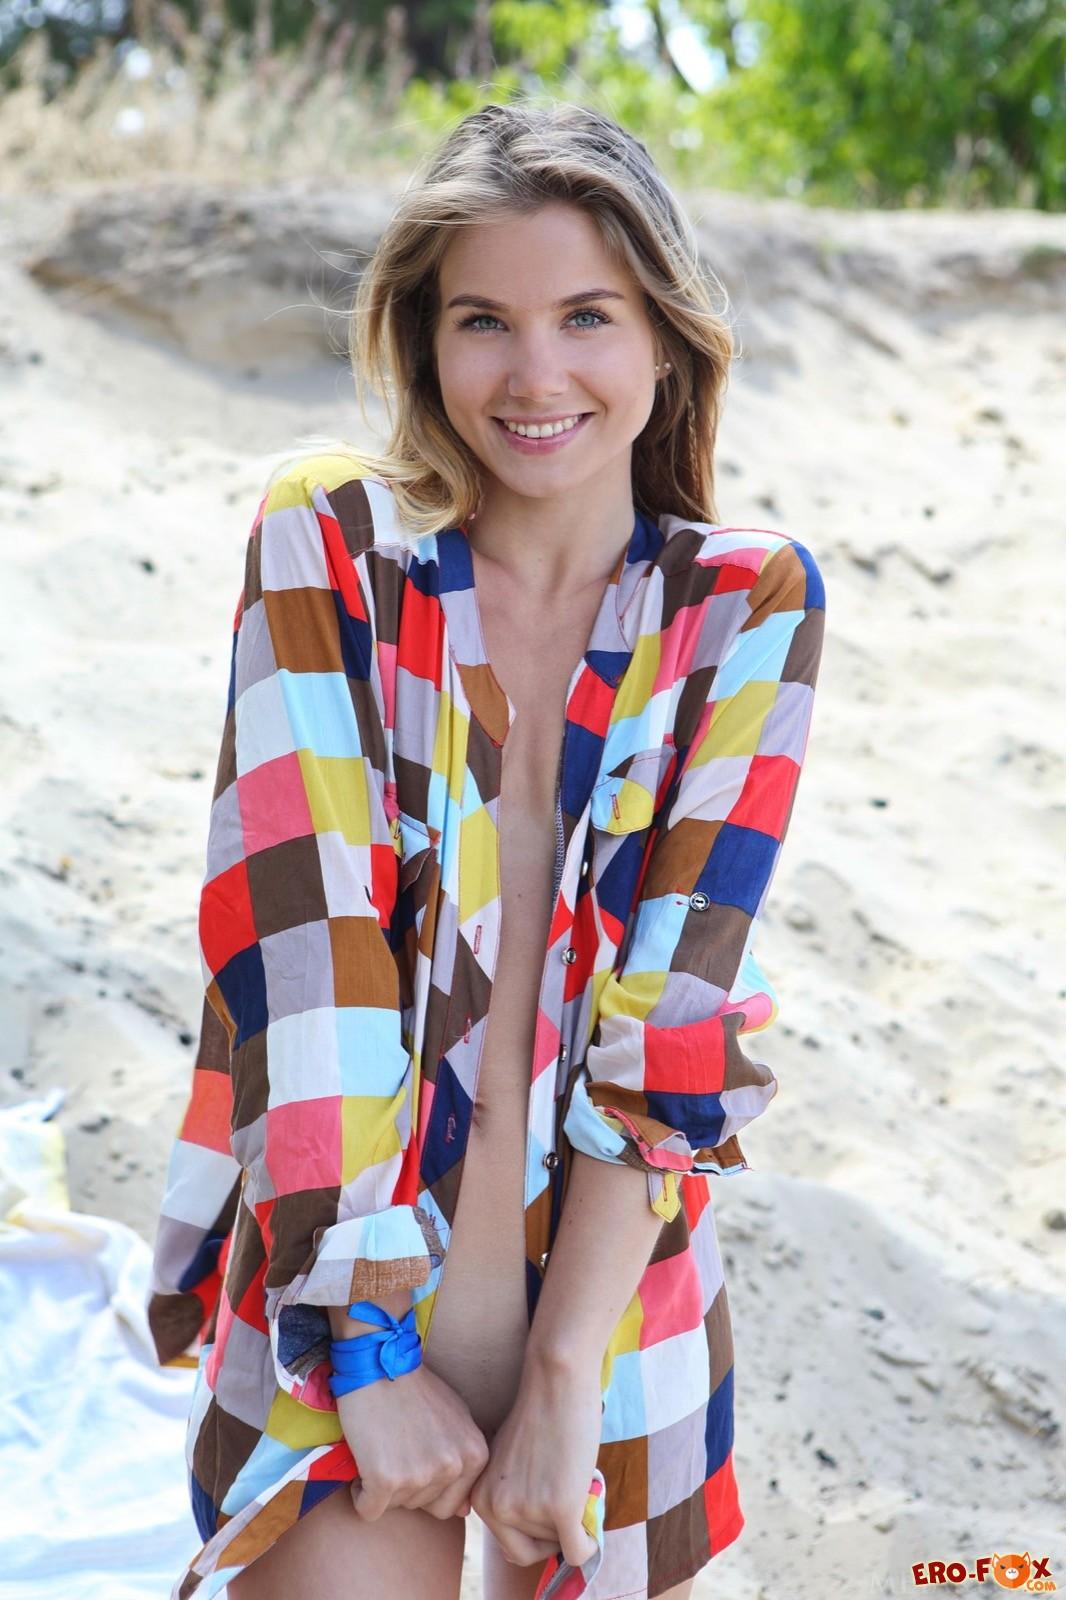 Милашка с плоской грудью сняла рубашку на пляже - фото